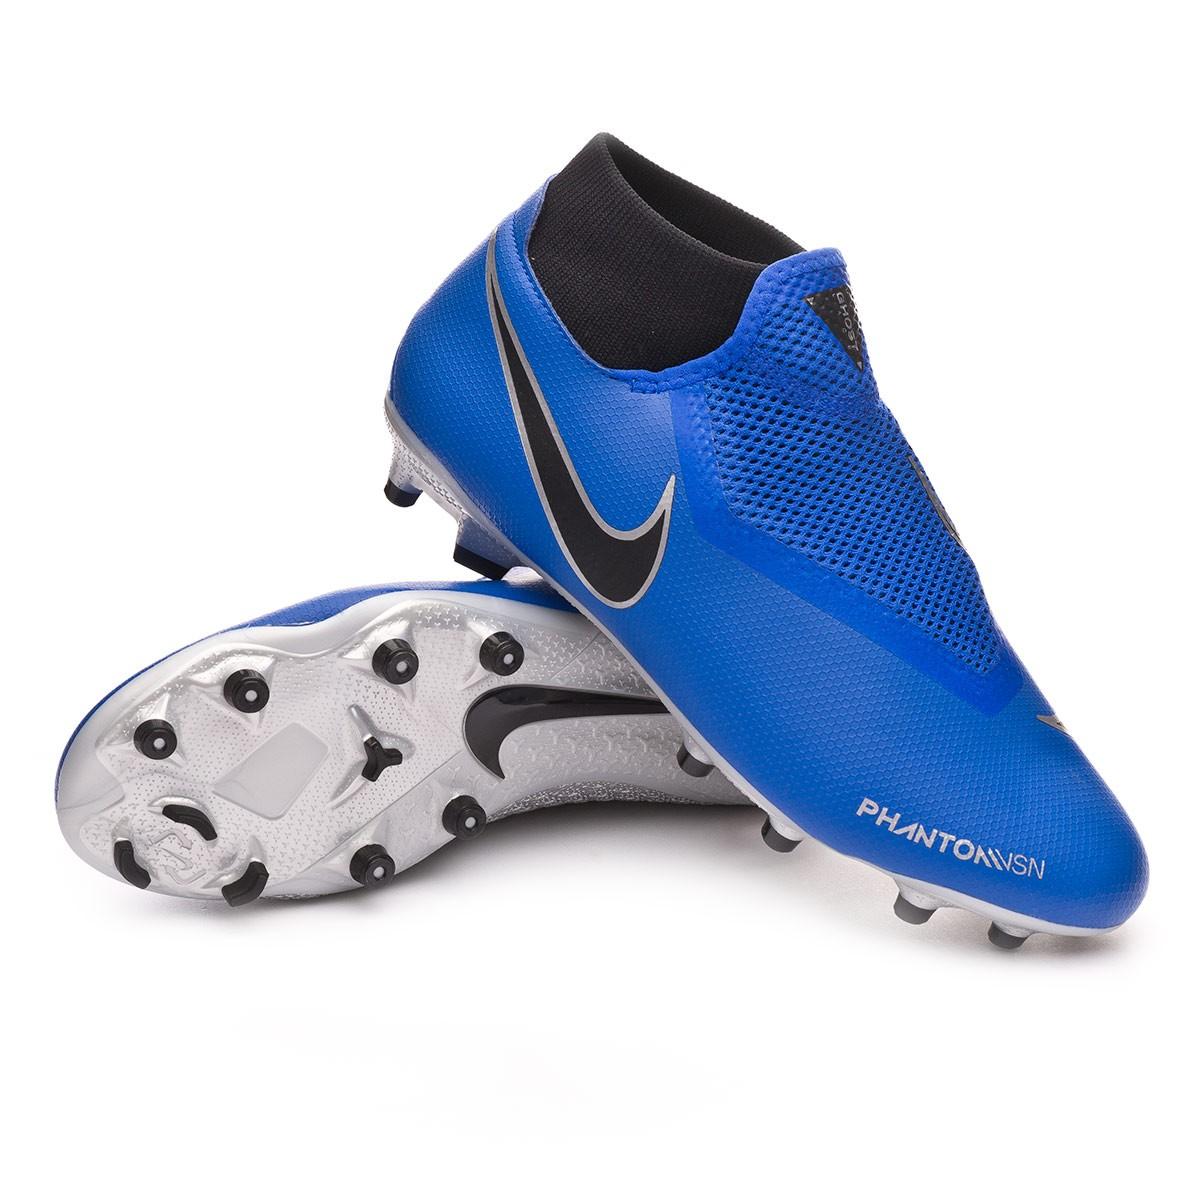 Football Boots Nike Phantom Vision